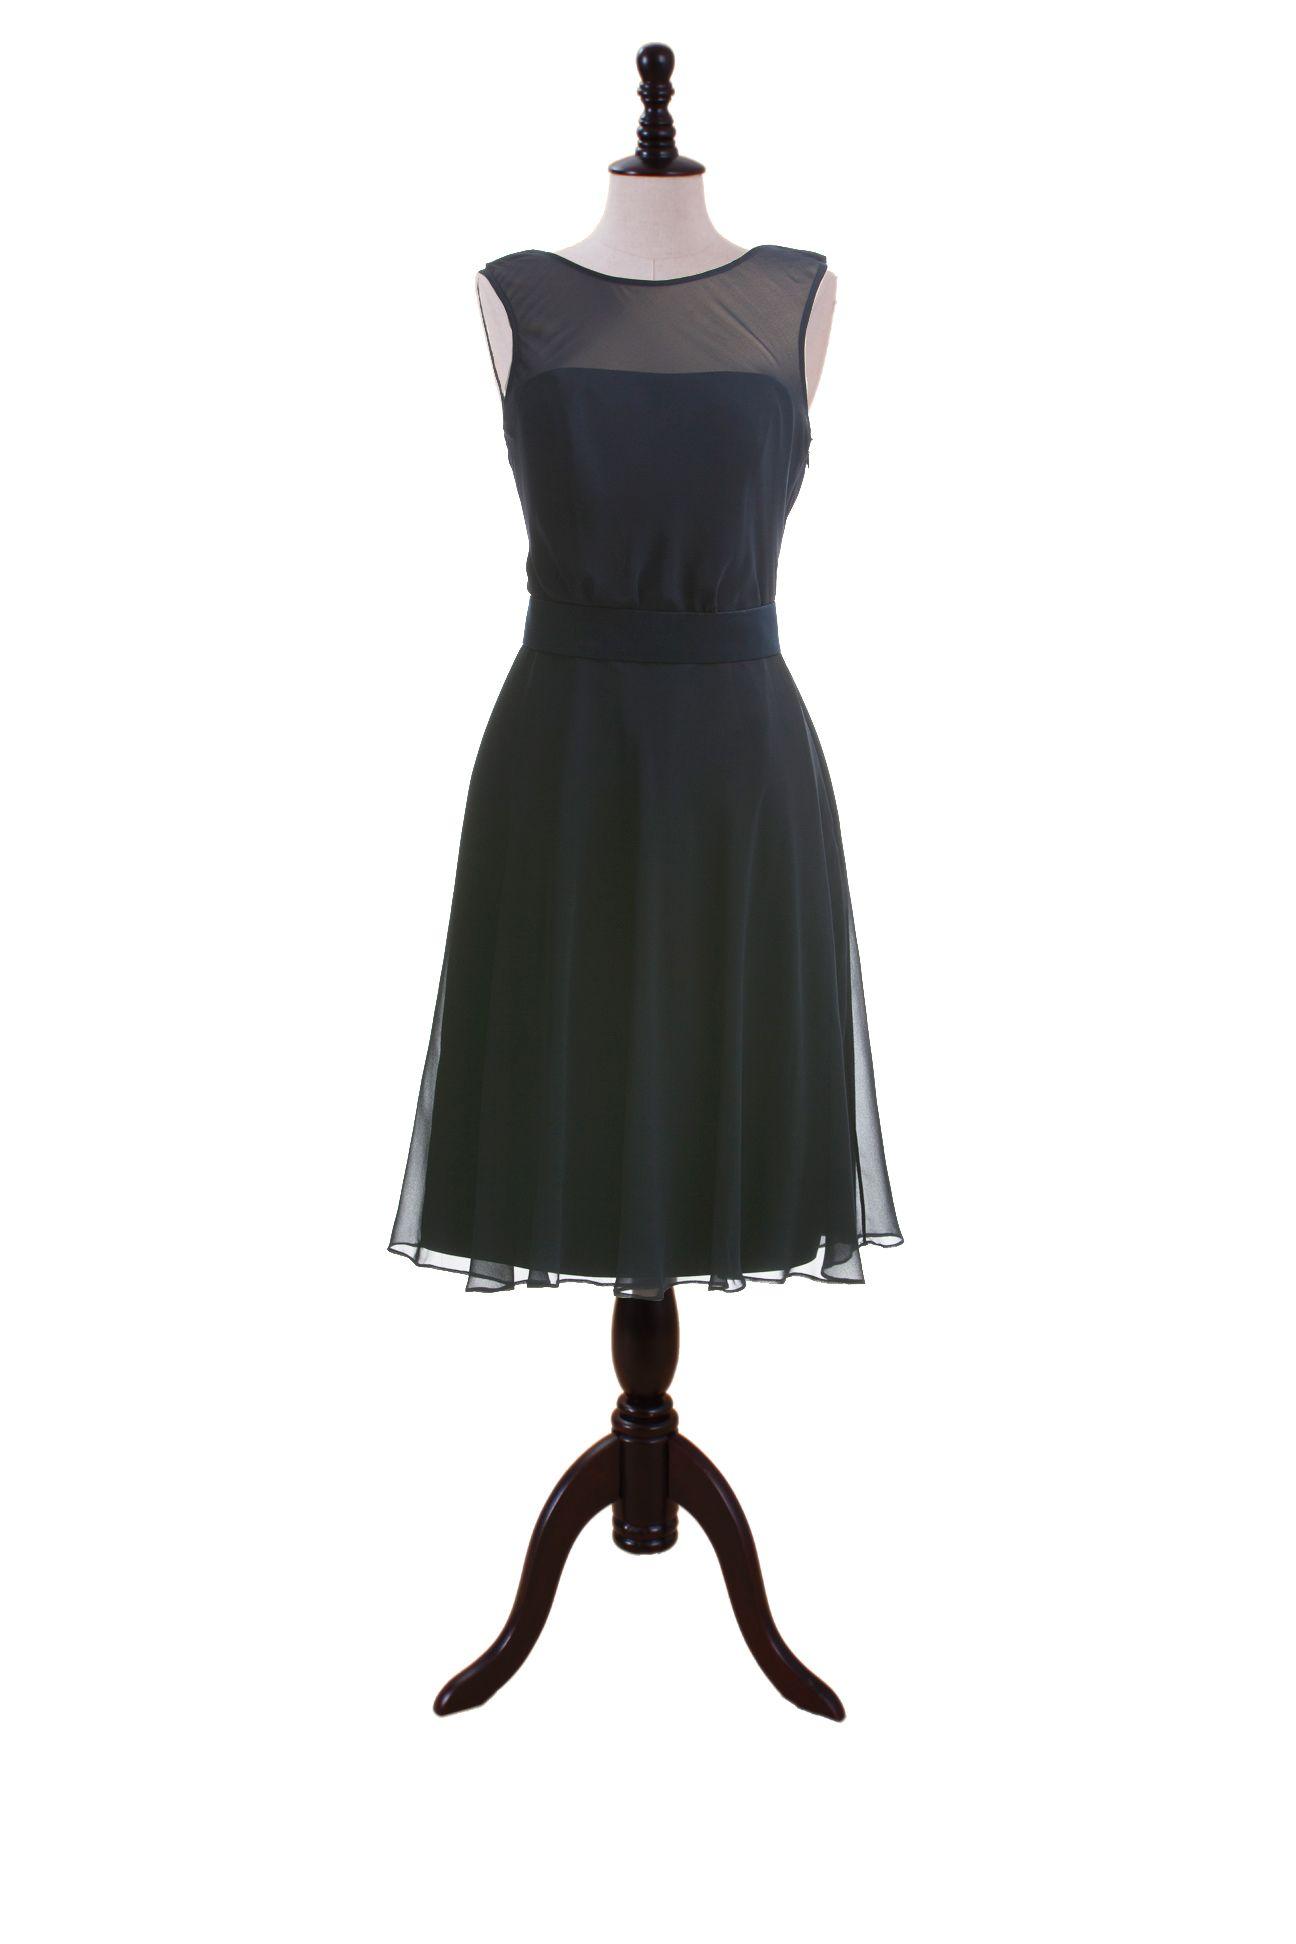 What to wear over a sleeveless dress to a wedding  Sleeveless Chiffon Dress with Bateau Neckline  wedding jewelry